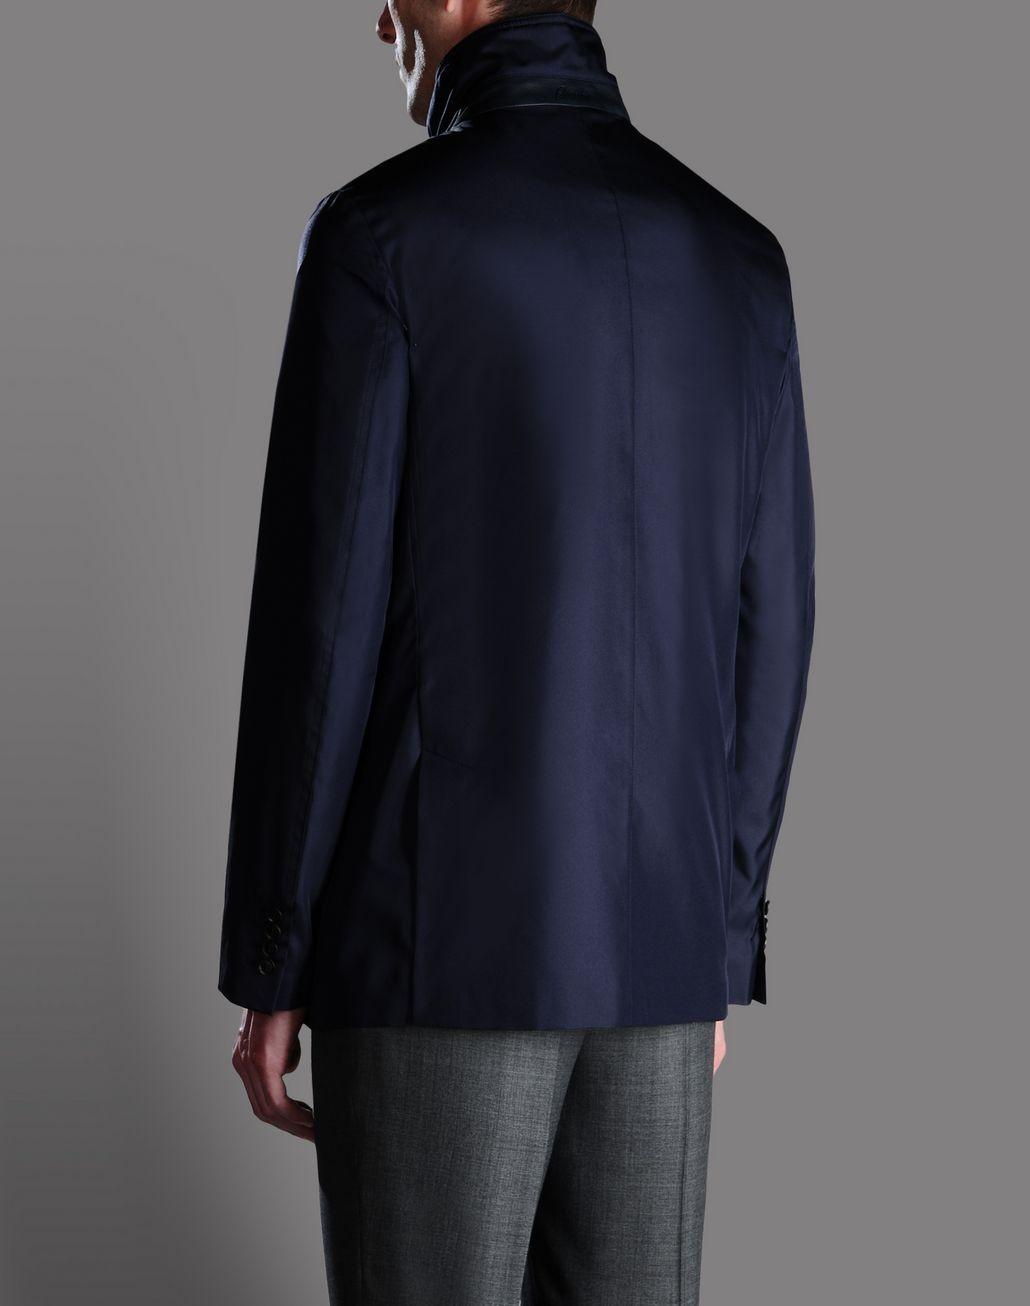 BRIONI STORM JACKET Outerwear U r